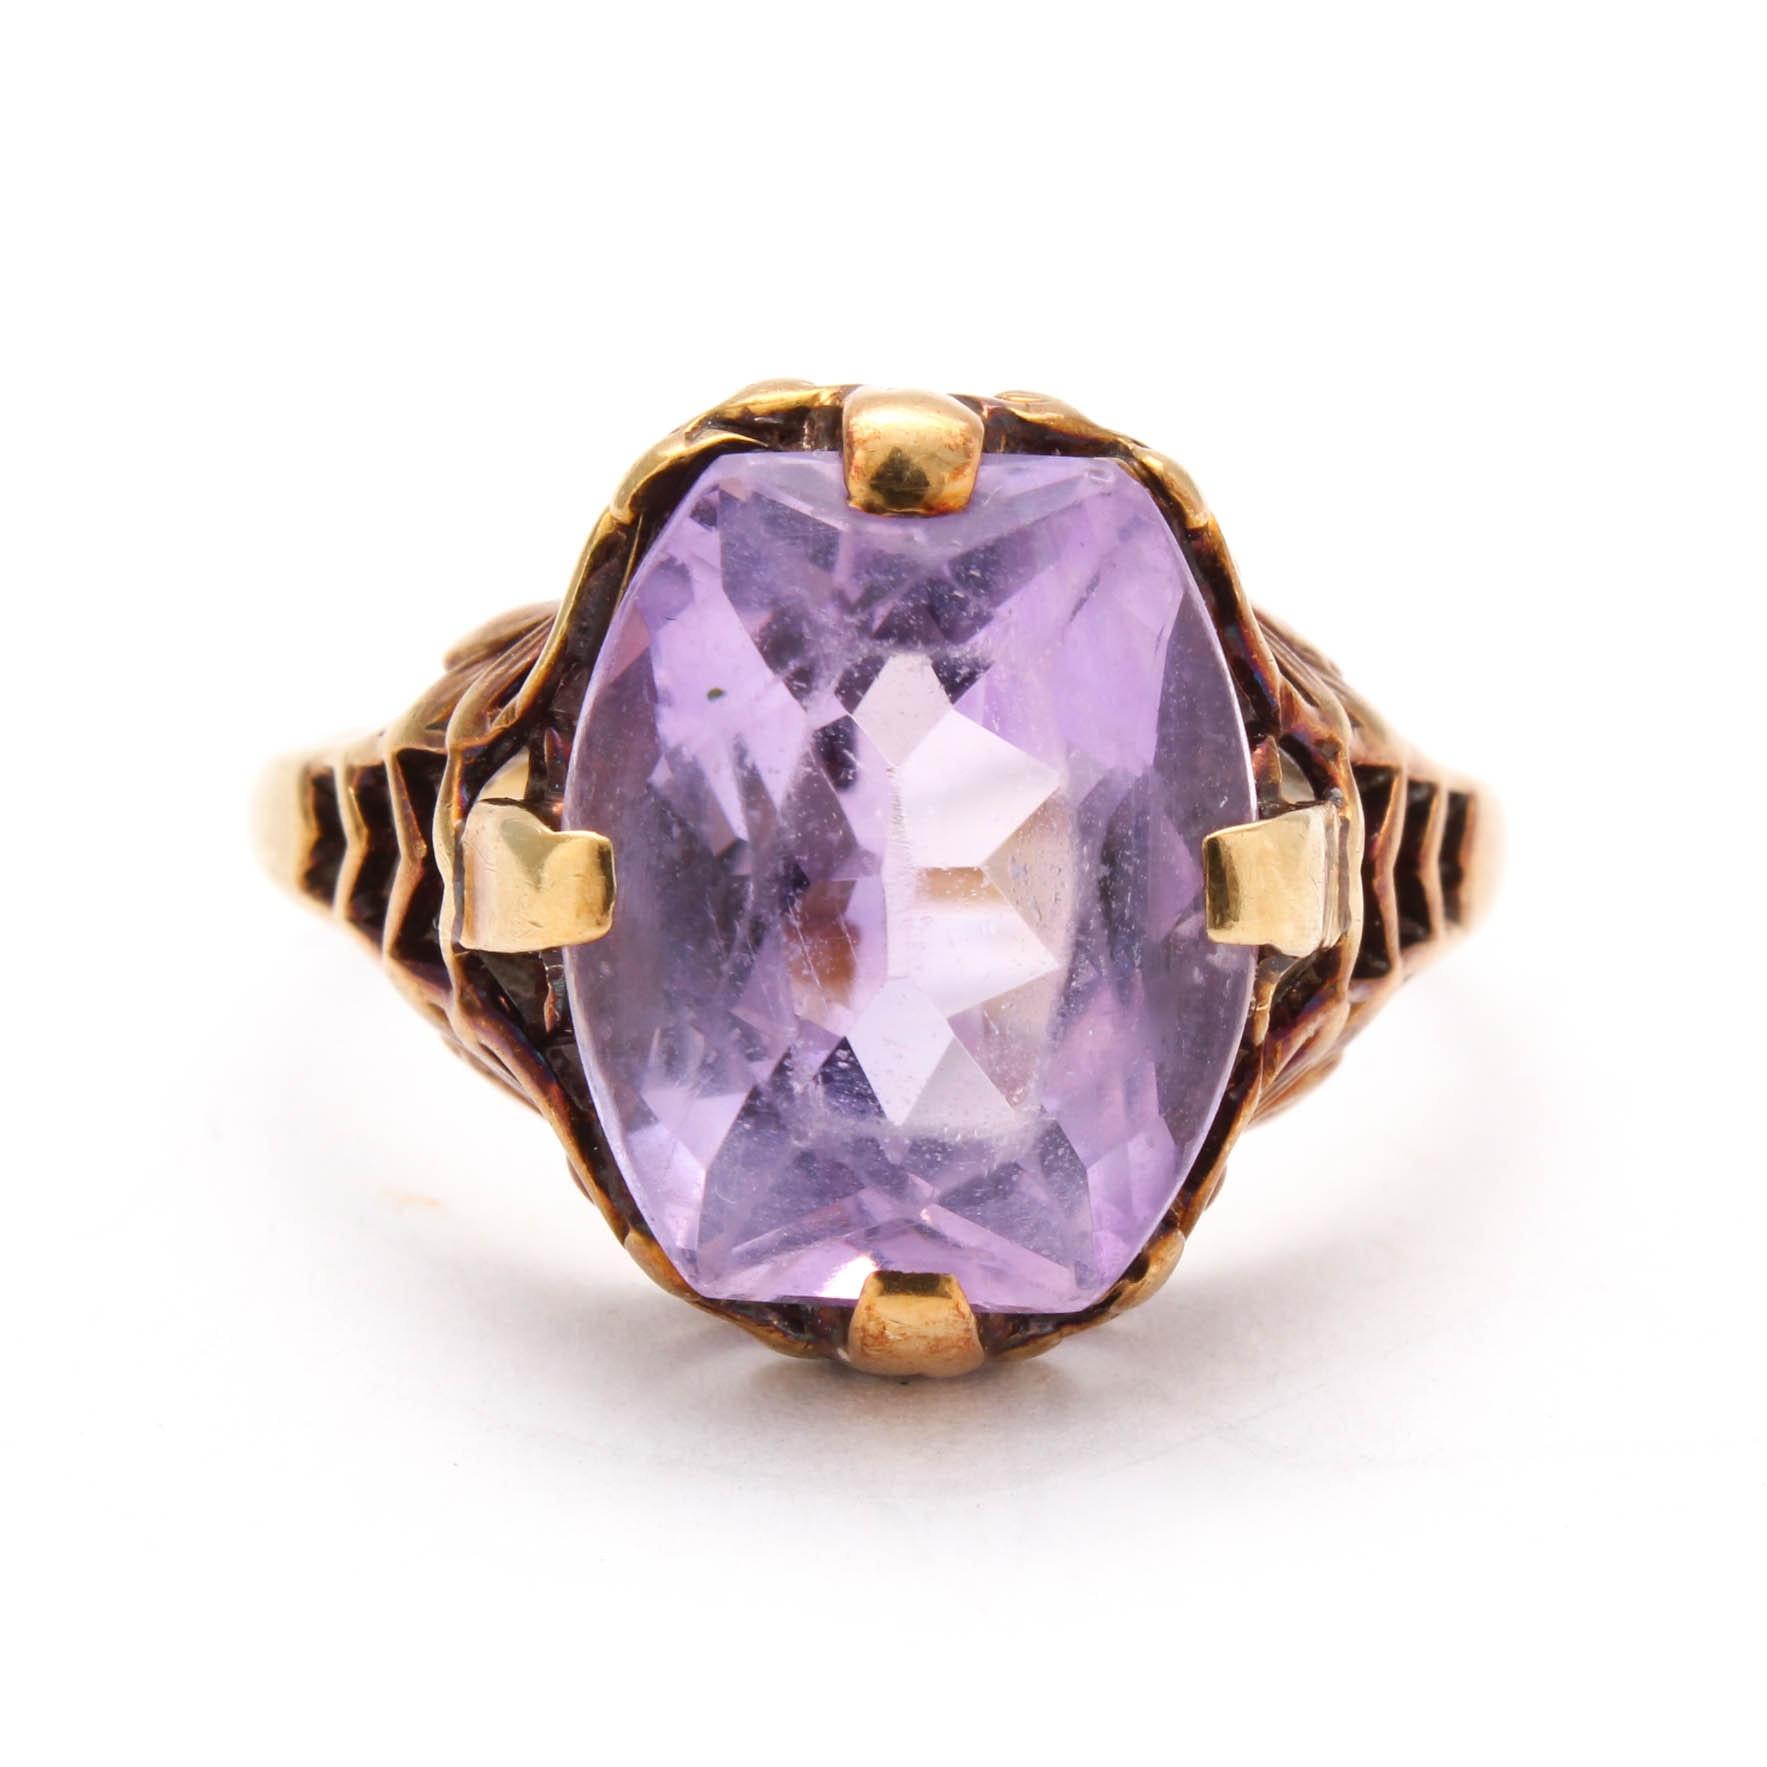 Vintage 14K Yellow Gold Amethyst Ring